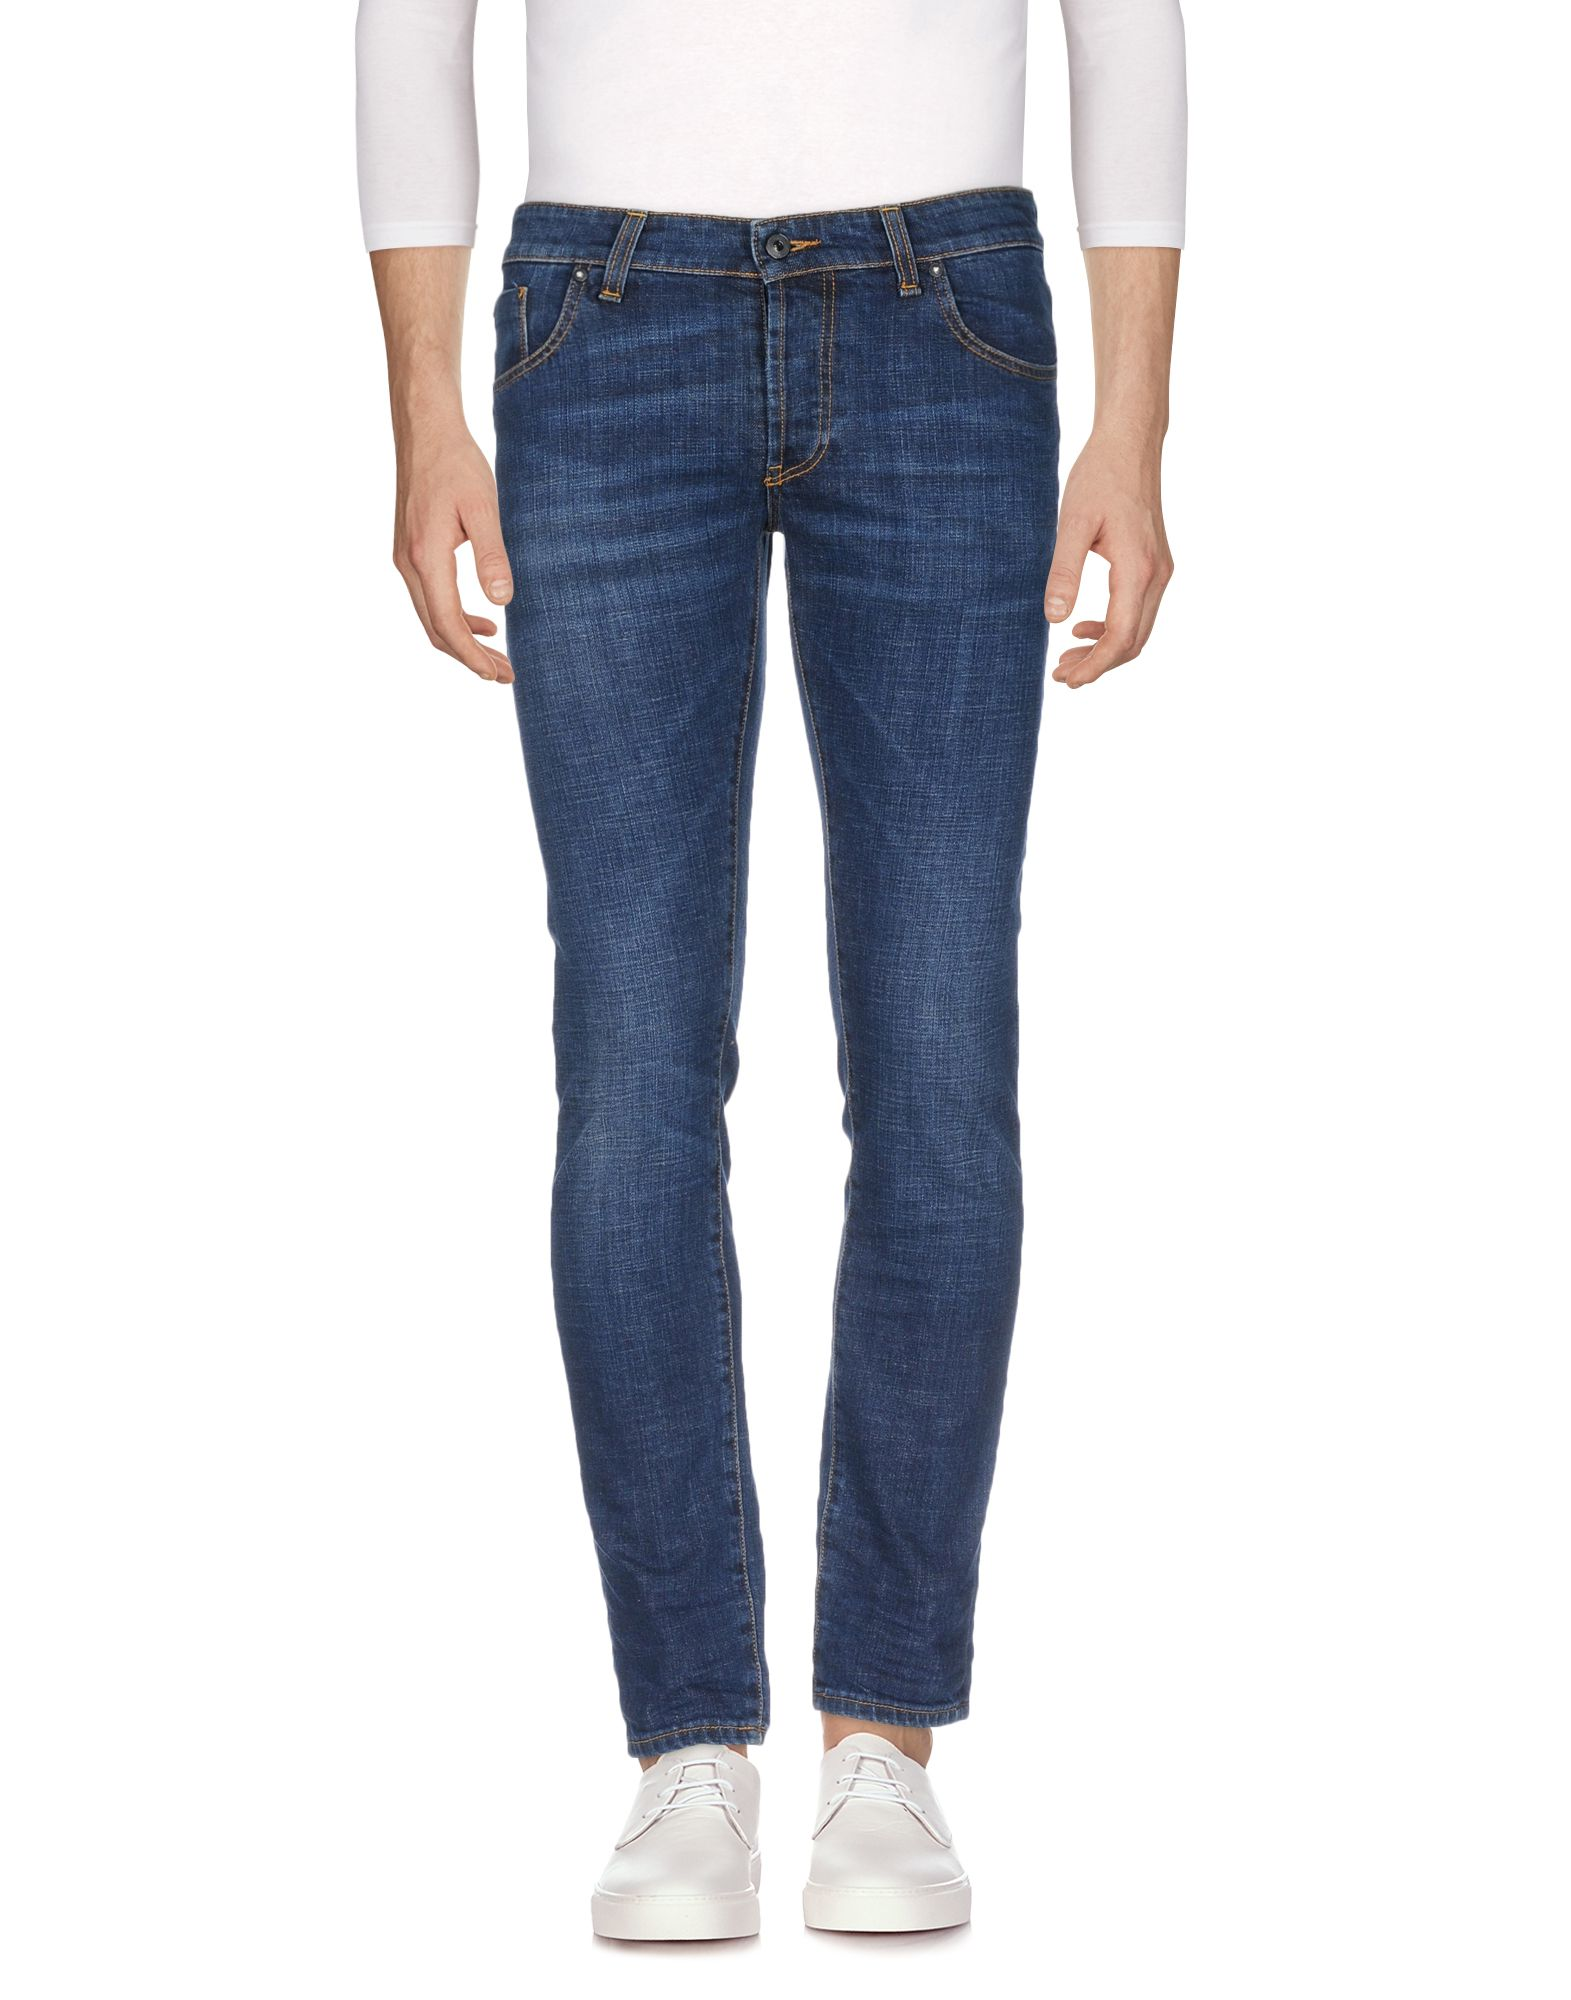 Pantaloni Jeans Messagerie Uomo - Acquista online su